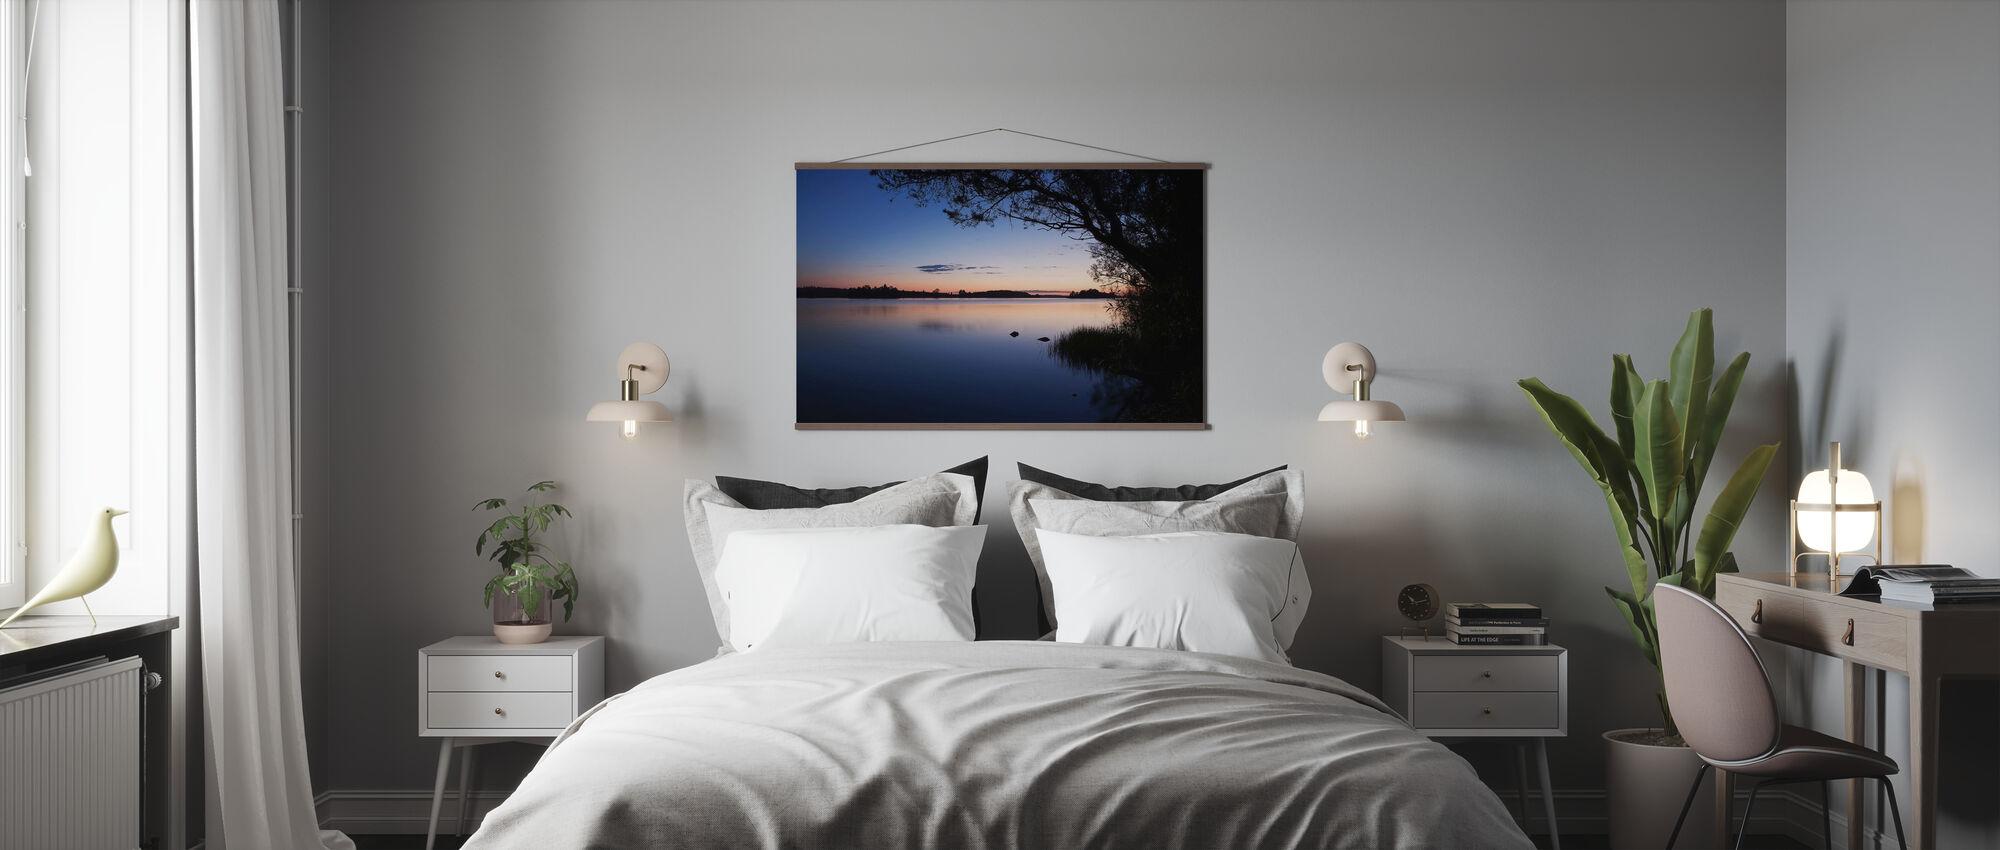 Blue Lake - Poster - Bedroom